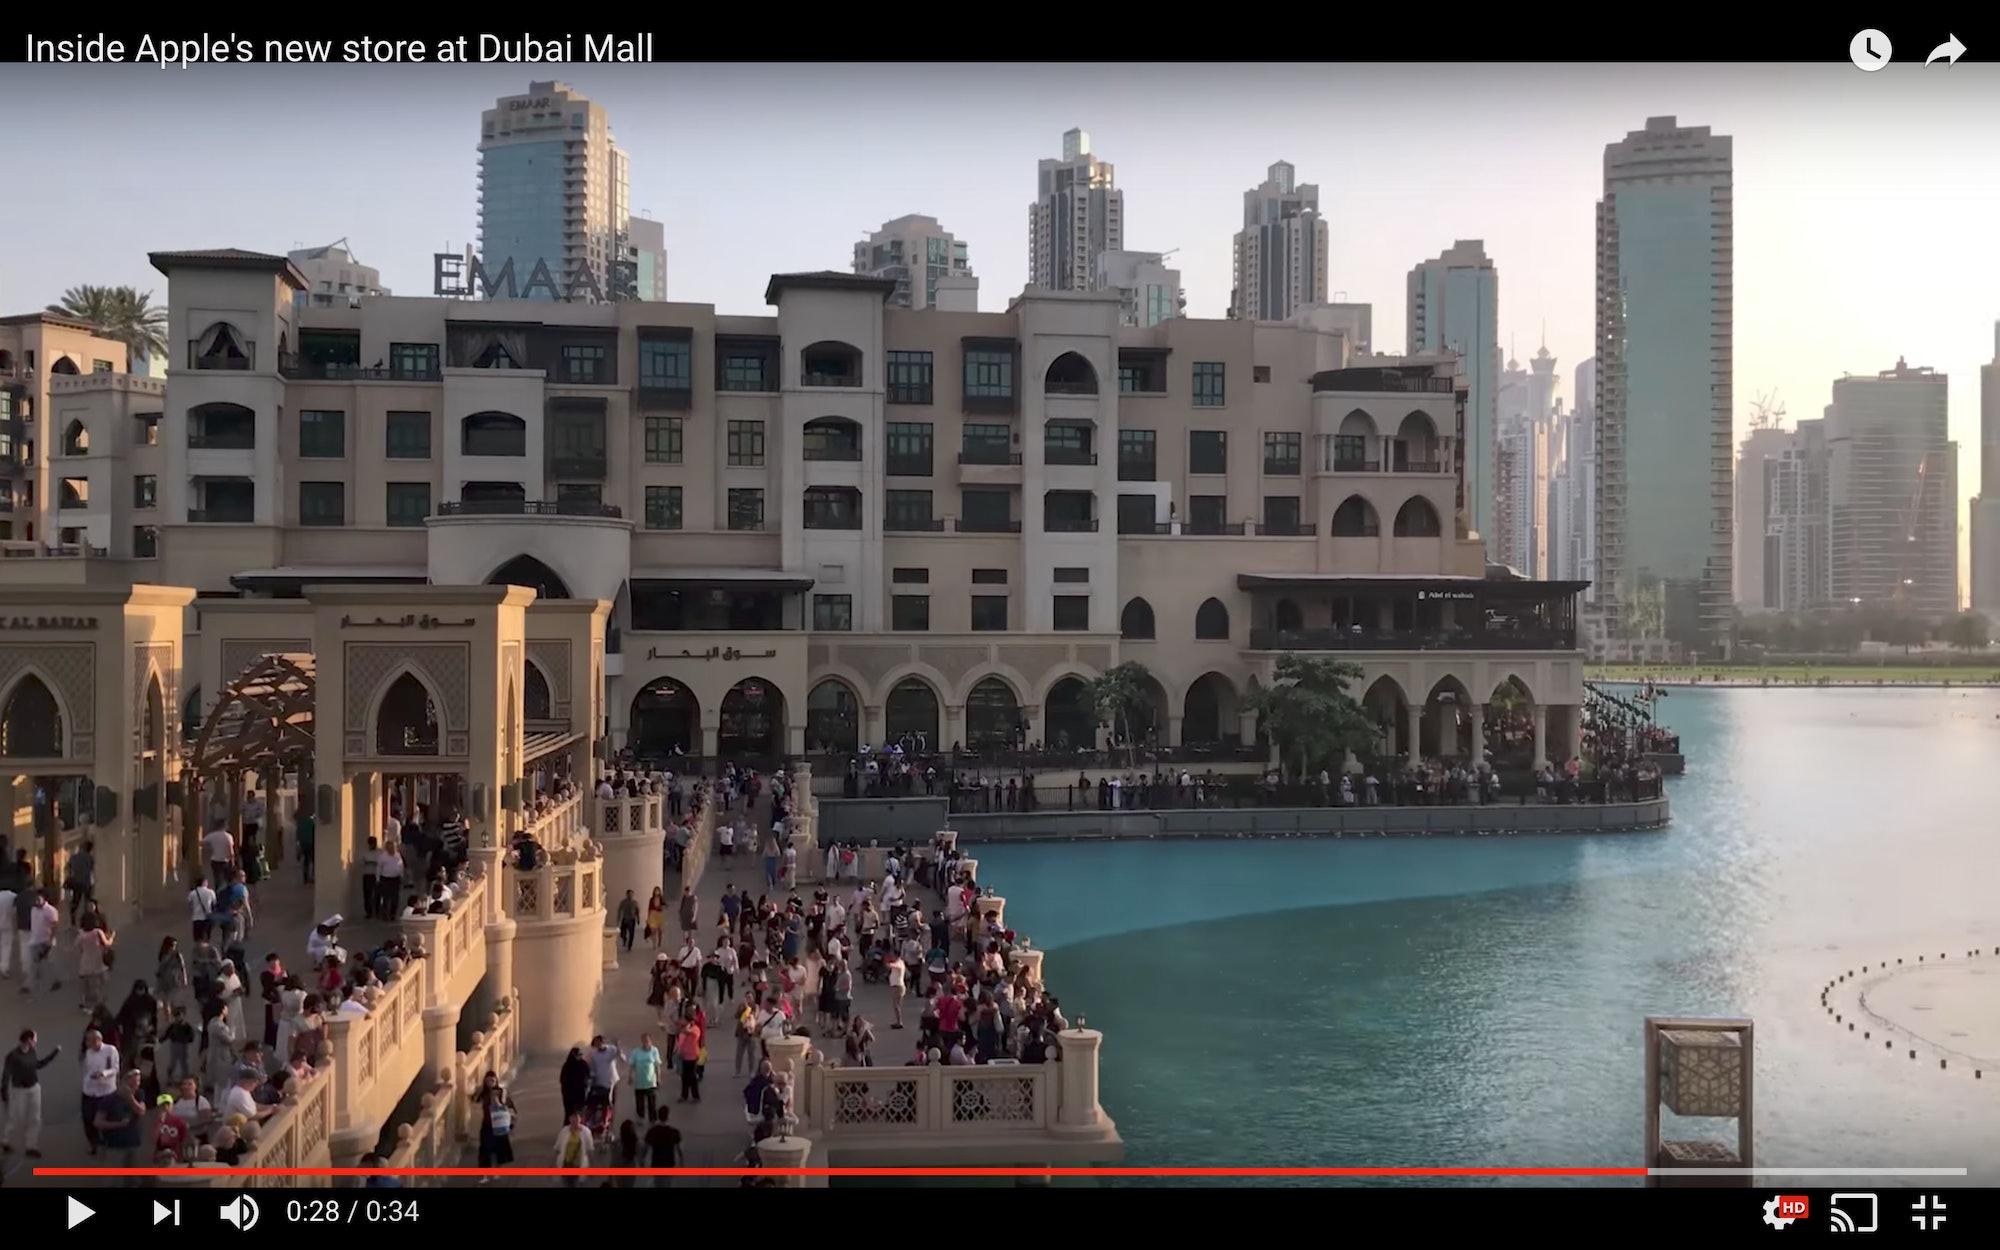 Apple Dubai Mall